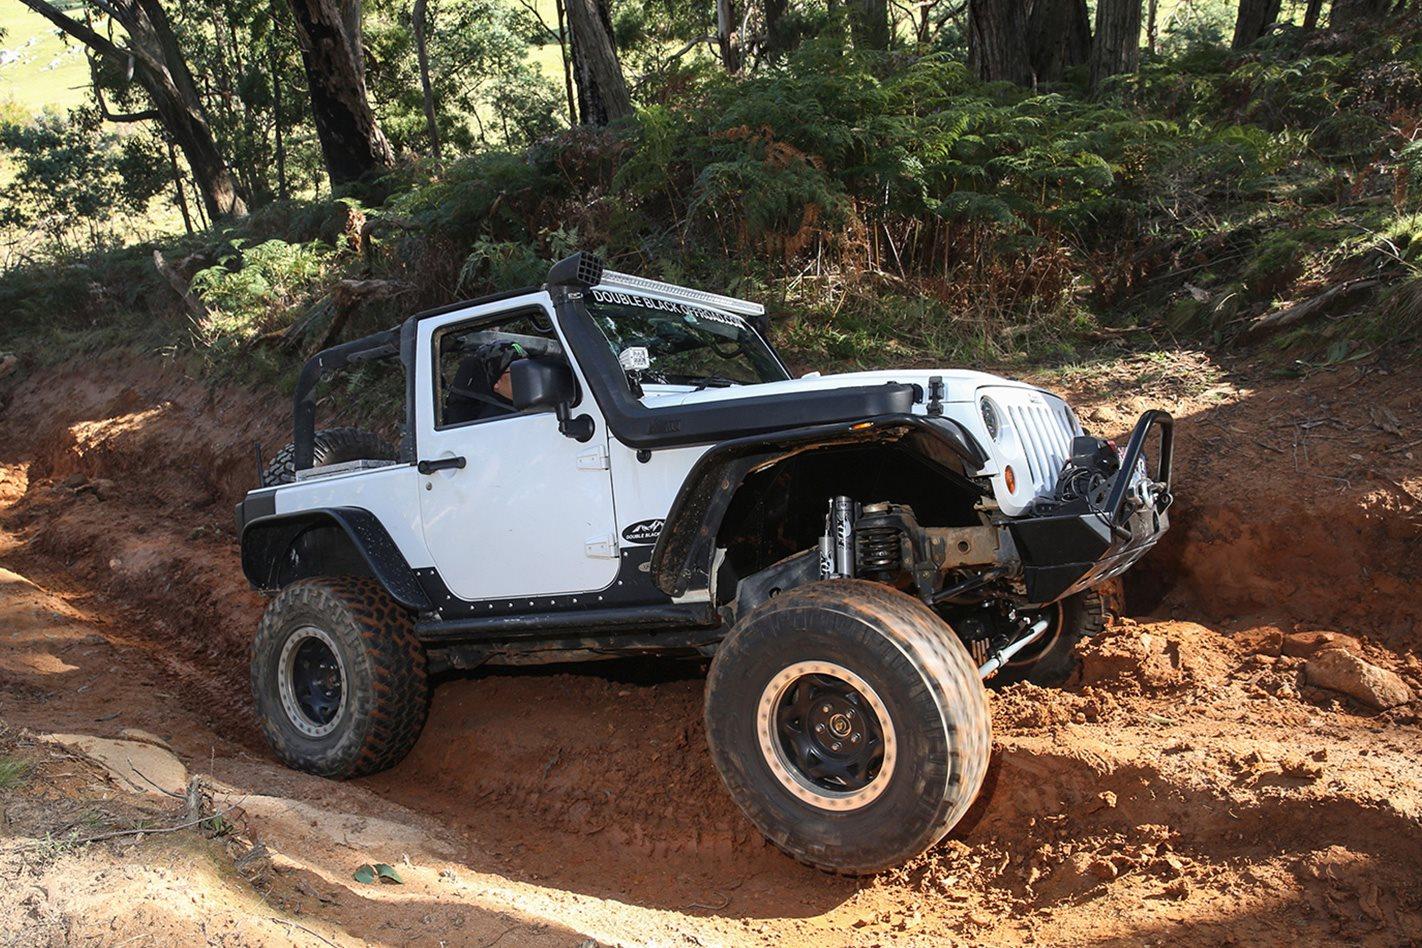 2013-Jeep-Wrangler-Rubicon-Double-Black-offroad-side.jpg